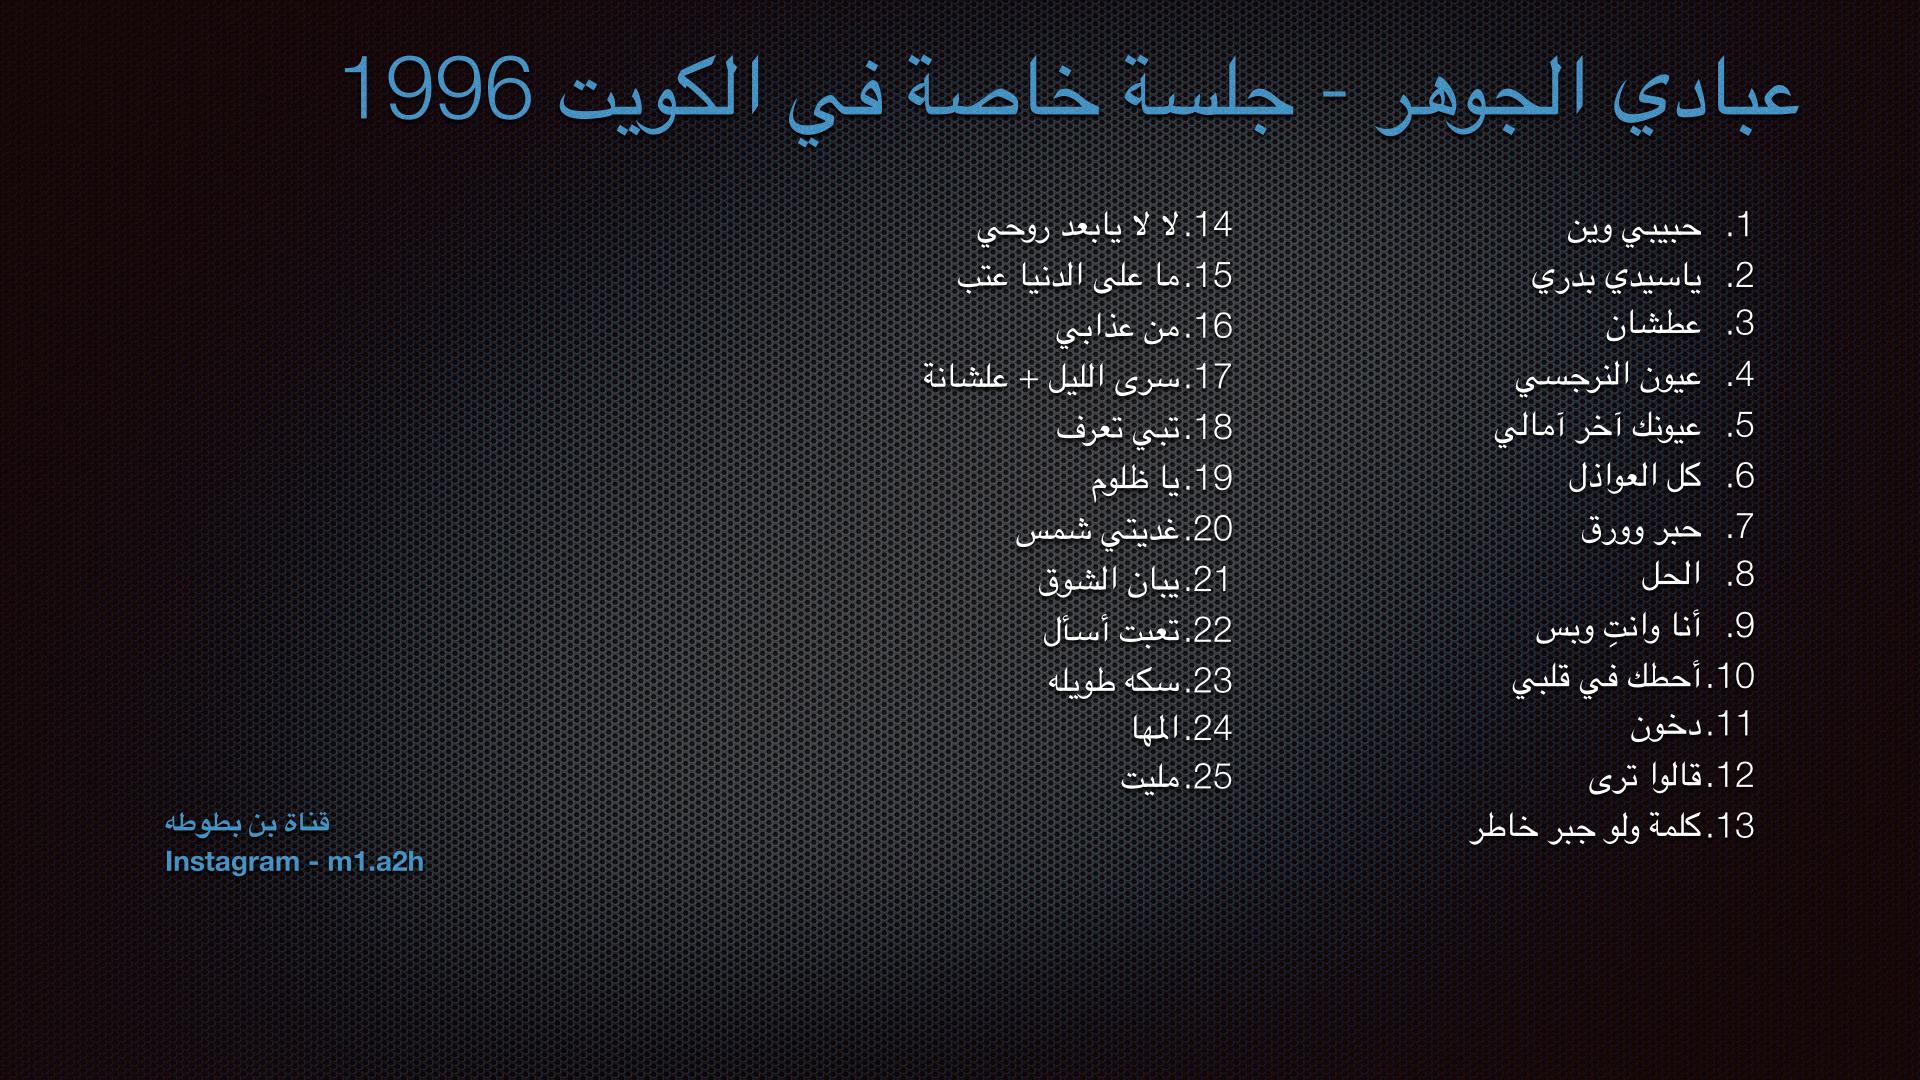 Pin By بن بطوطه منتدى طلال مداح On Abady Al Jawhar Weather Screenshot 21st Screenshots